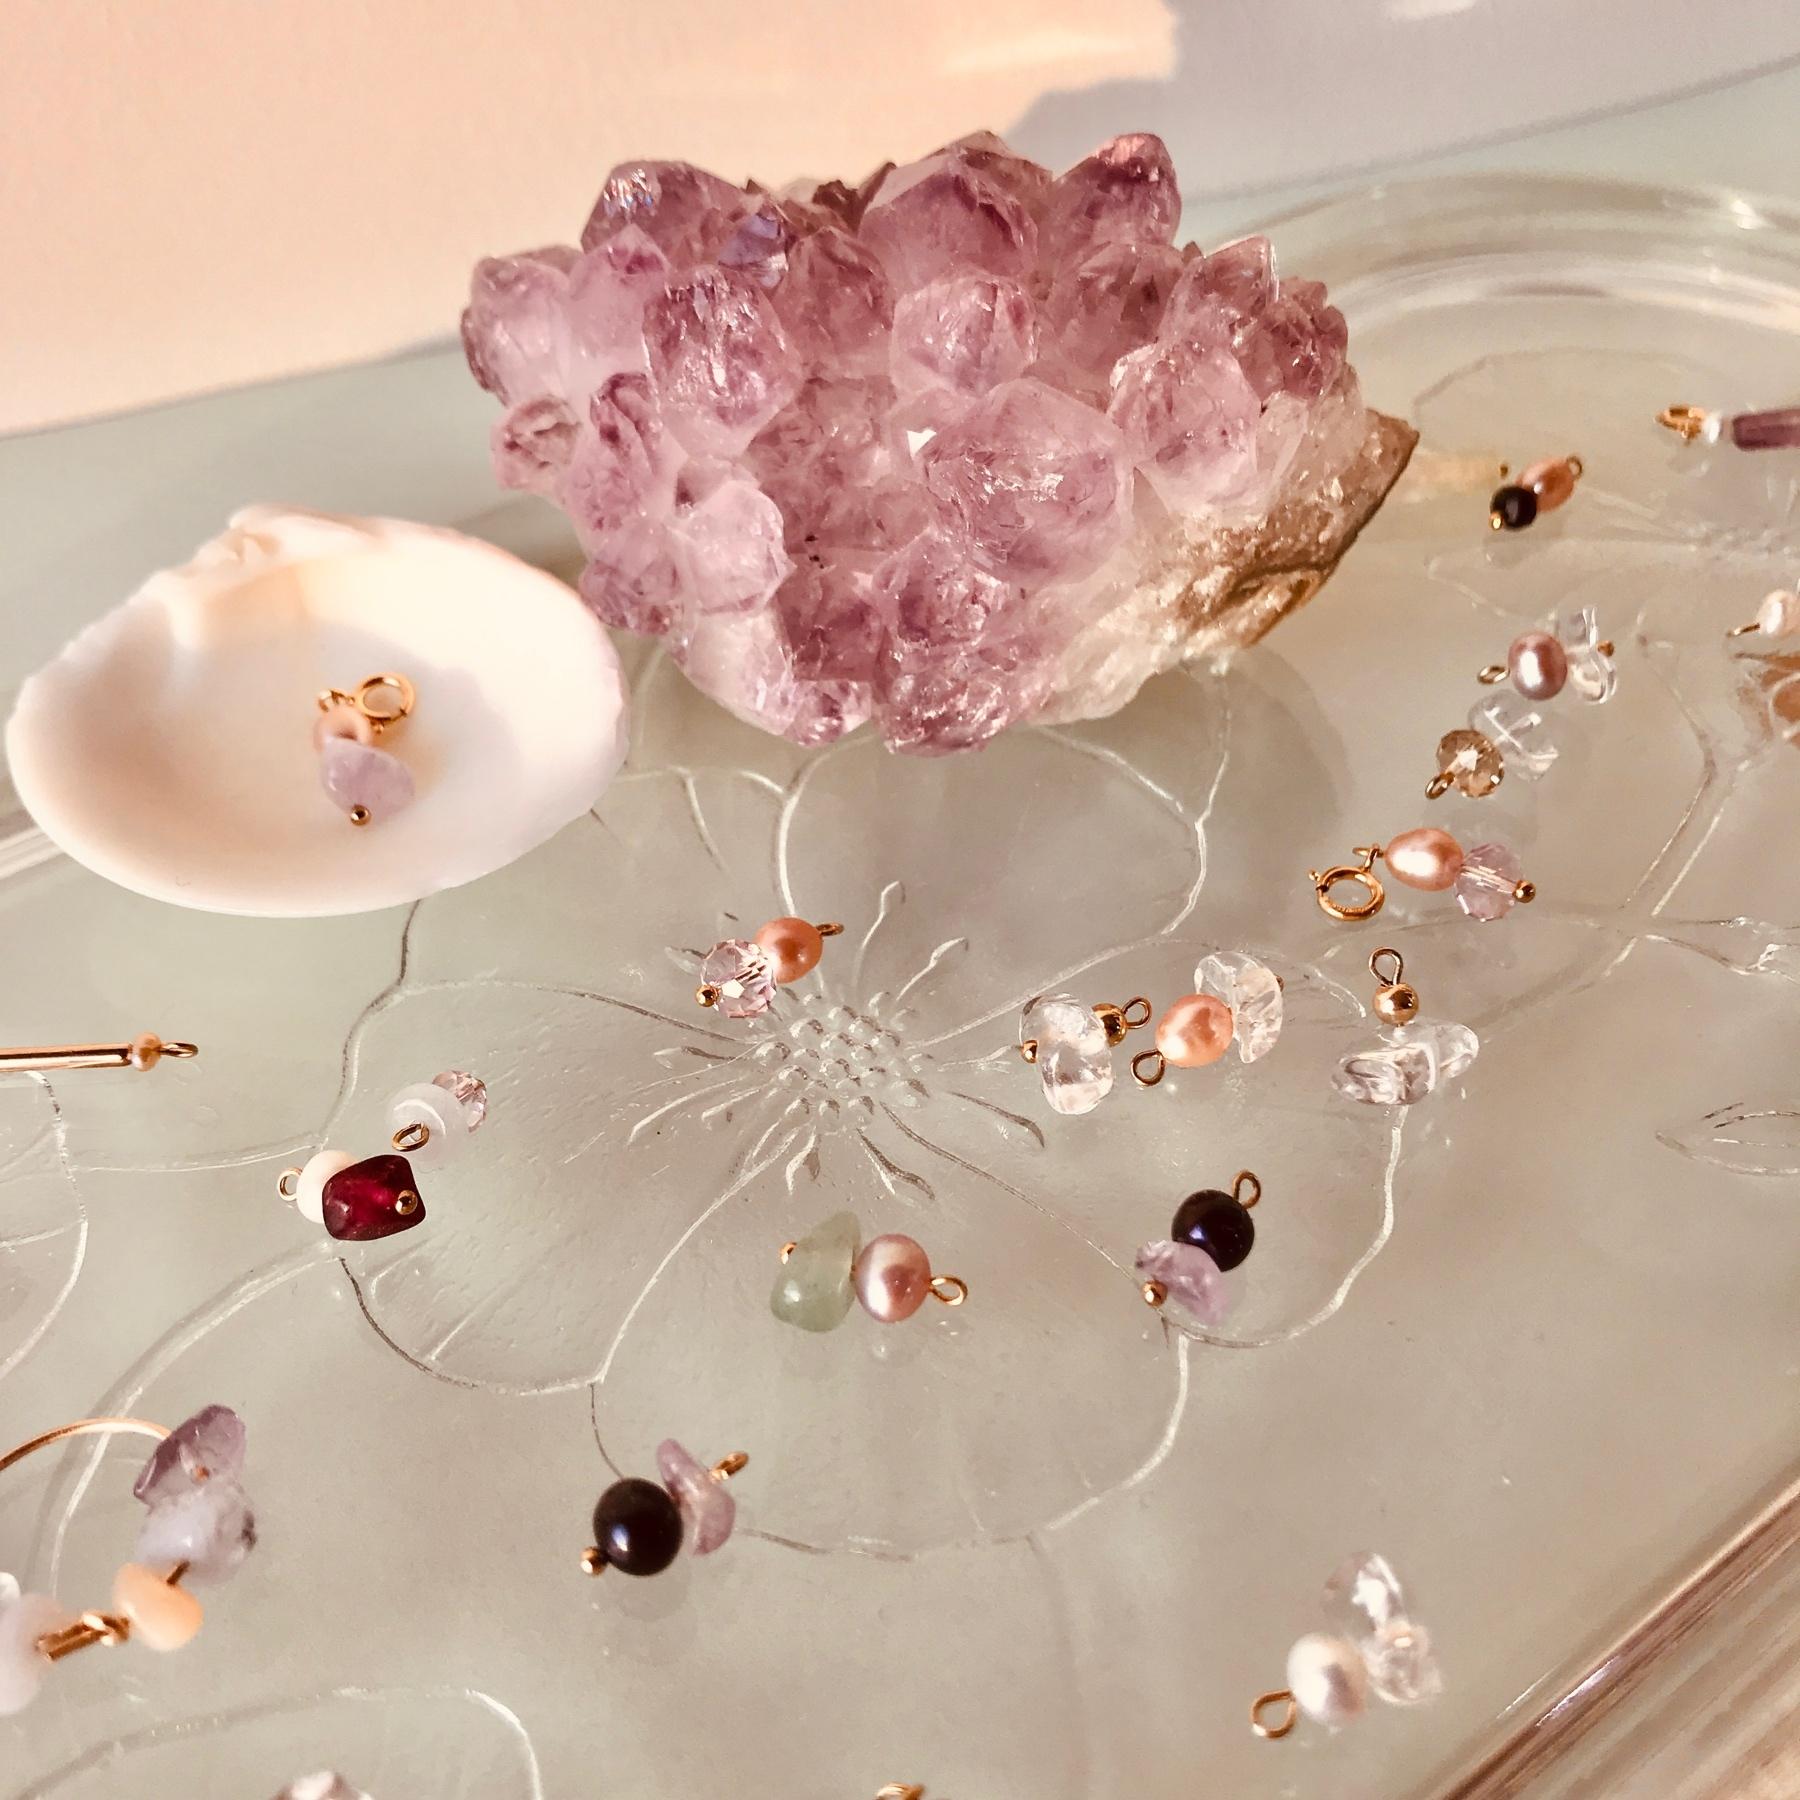 Jewelry SU SUIS Studio